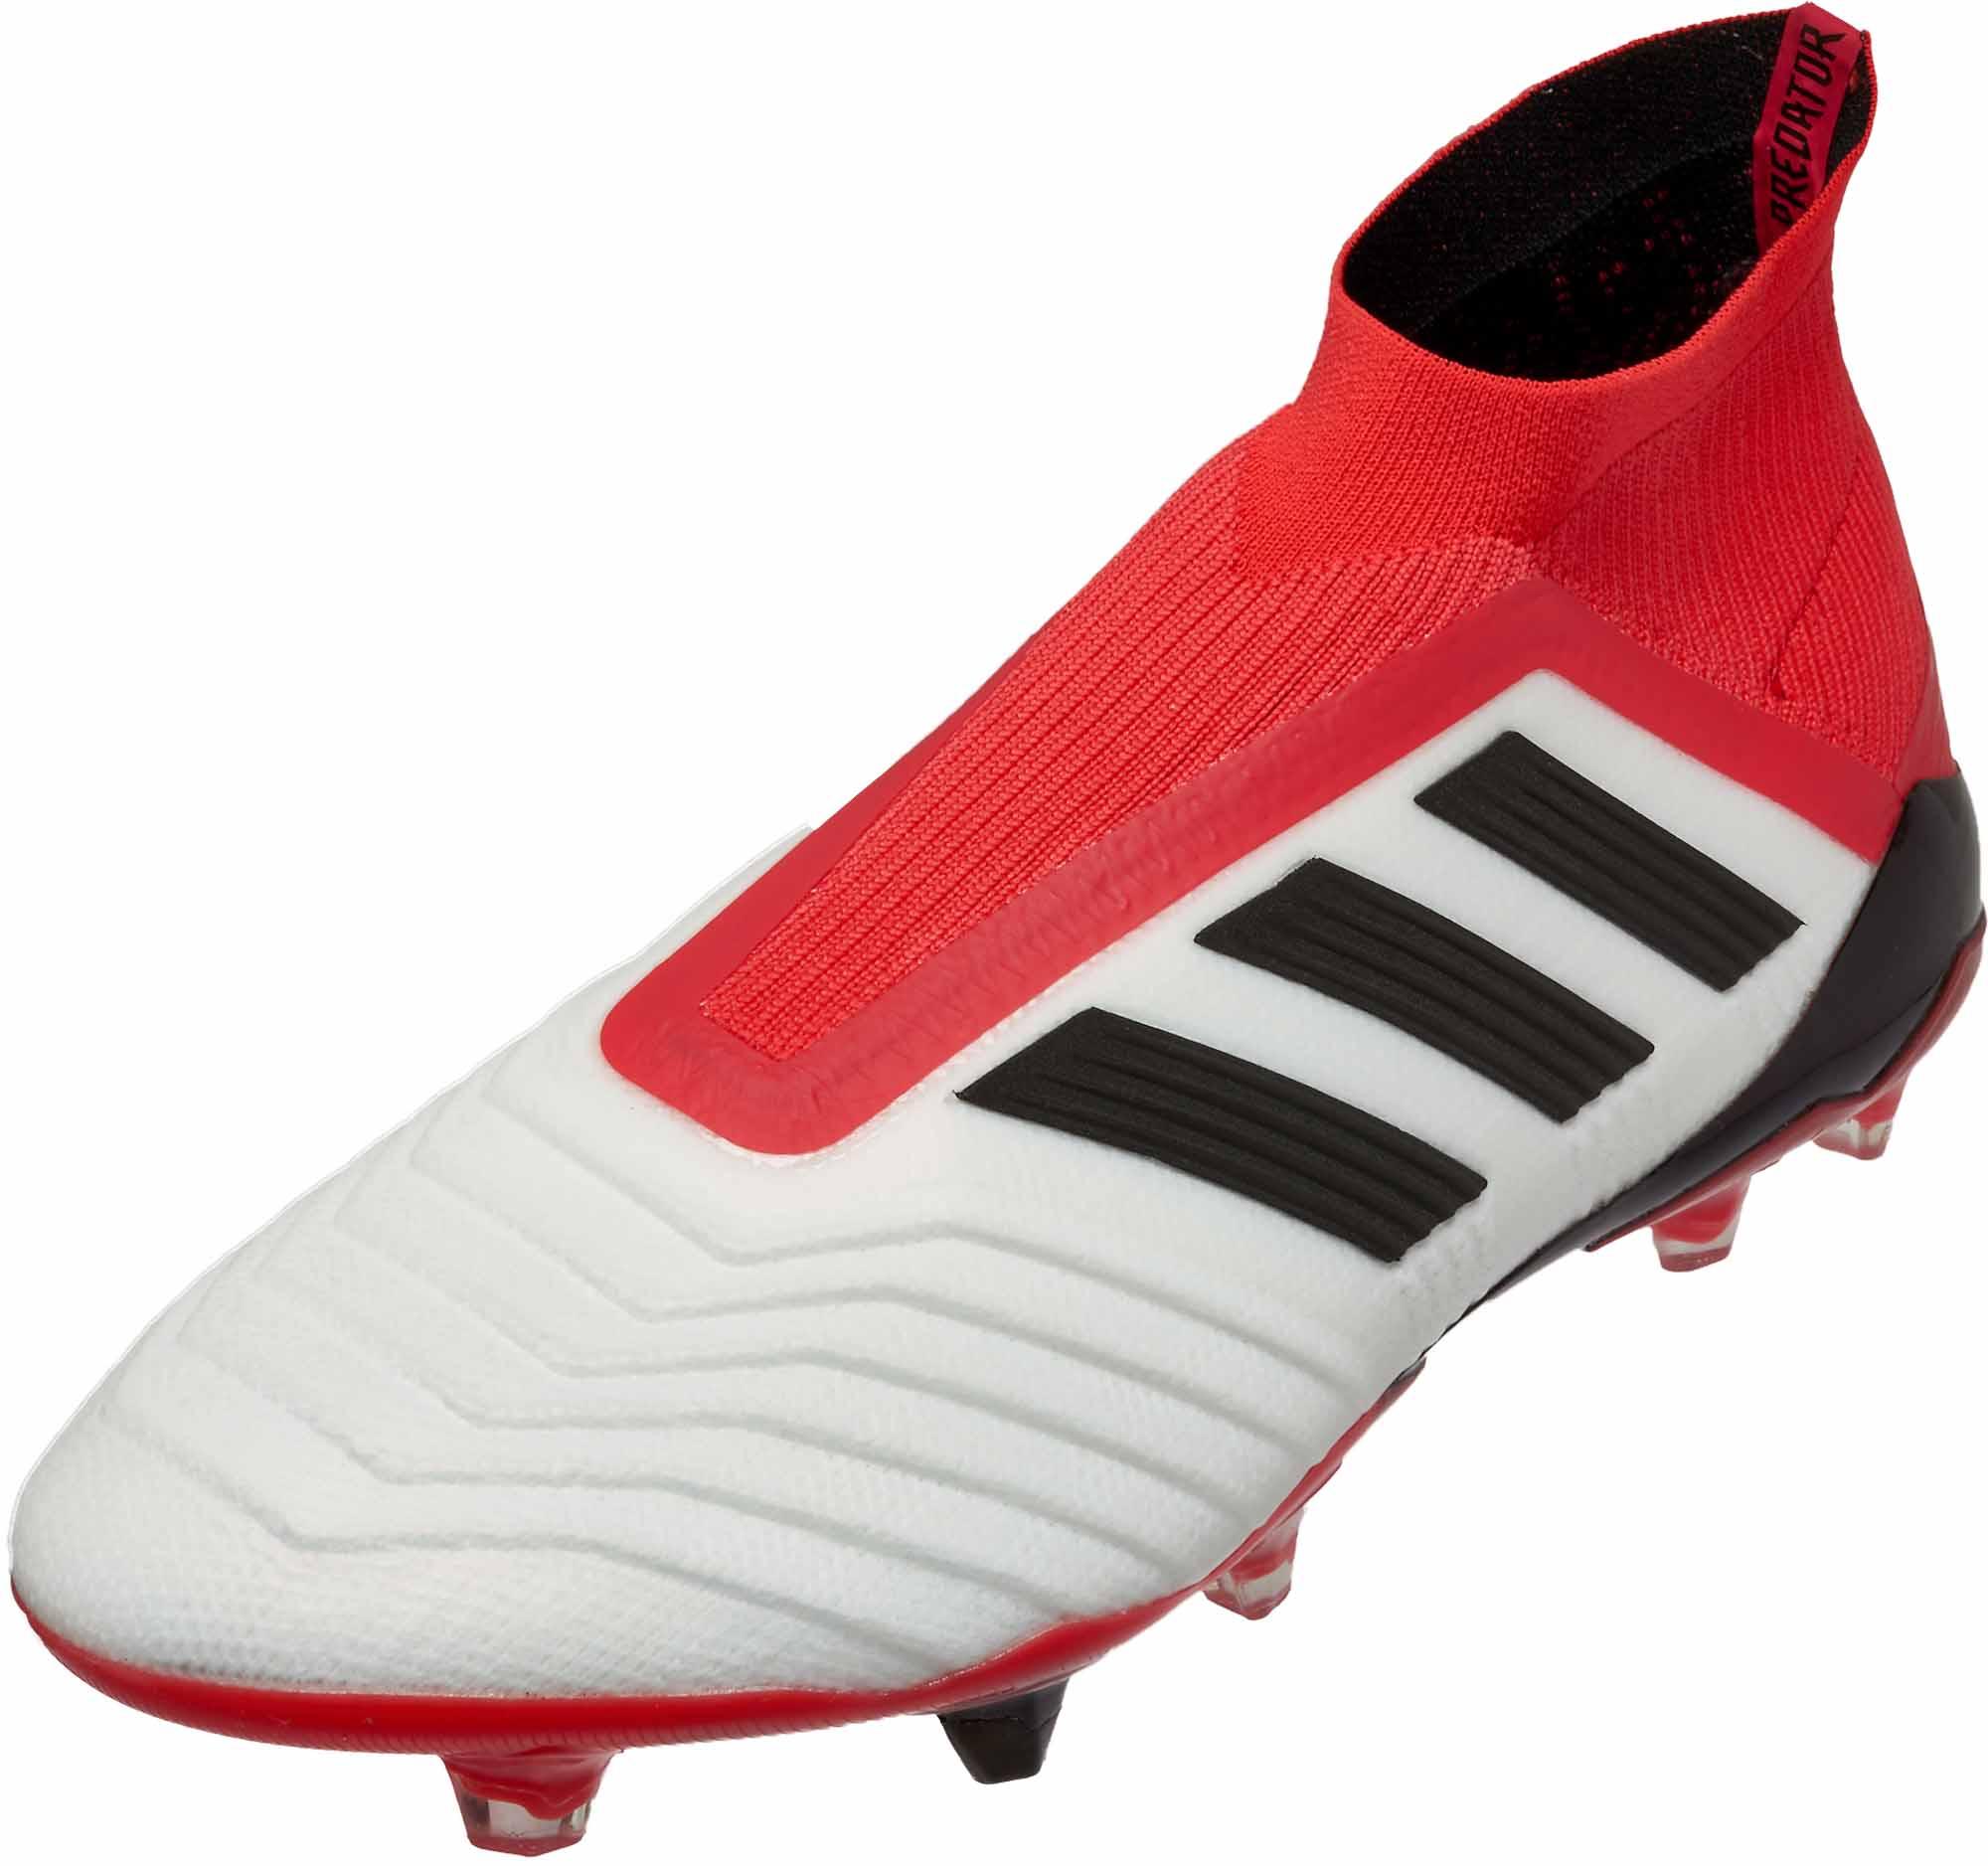 adidas Predator 19575 18+ FG adidas FG blanco y real Coral Soccer Master c5c60f0 - sfitness.xyz